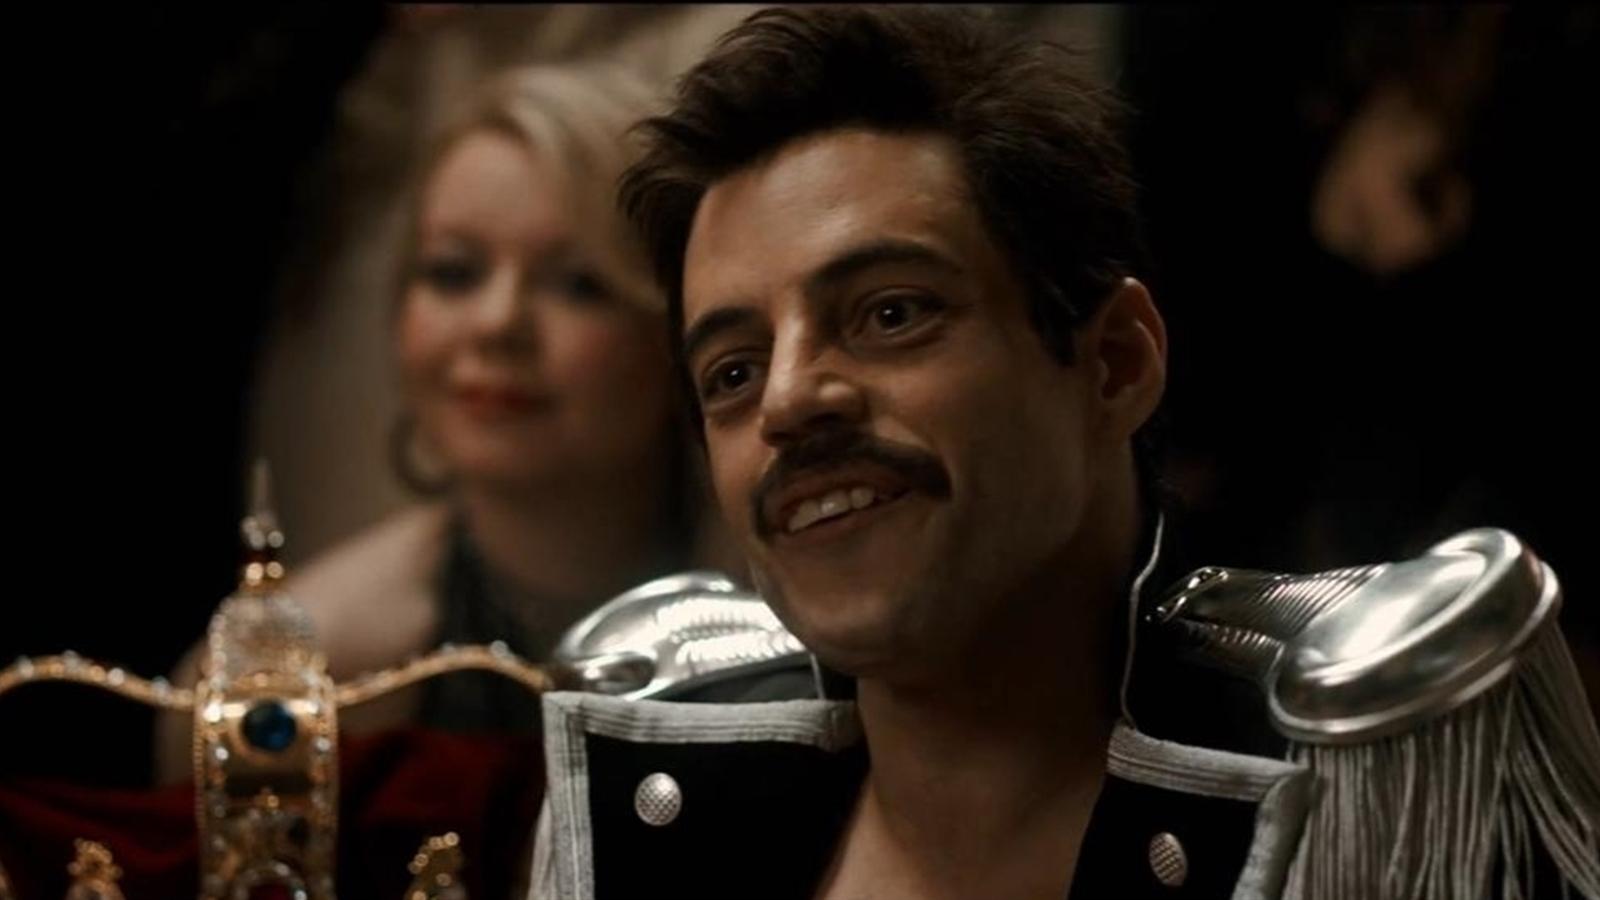 Bohemian Malek»: Una mirada crítica de 'Bohemian Rhapsody'